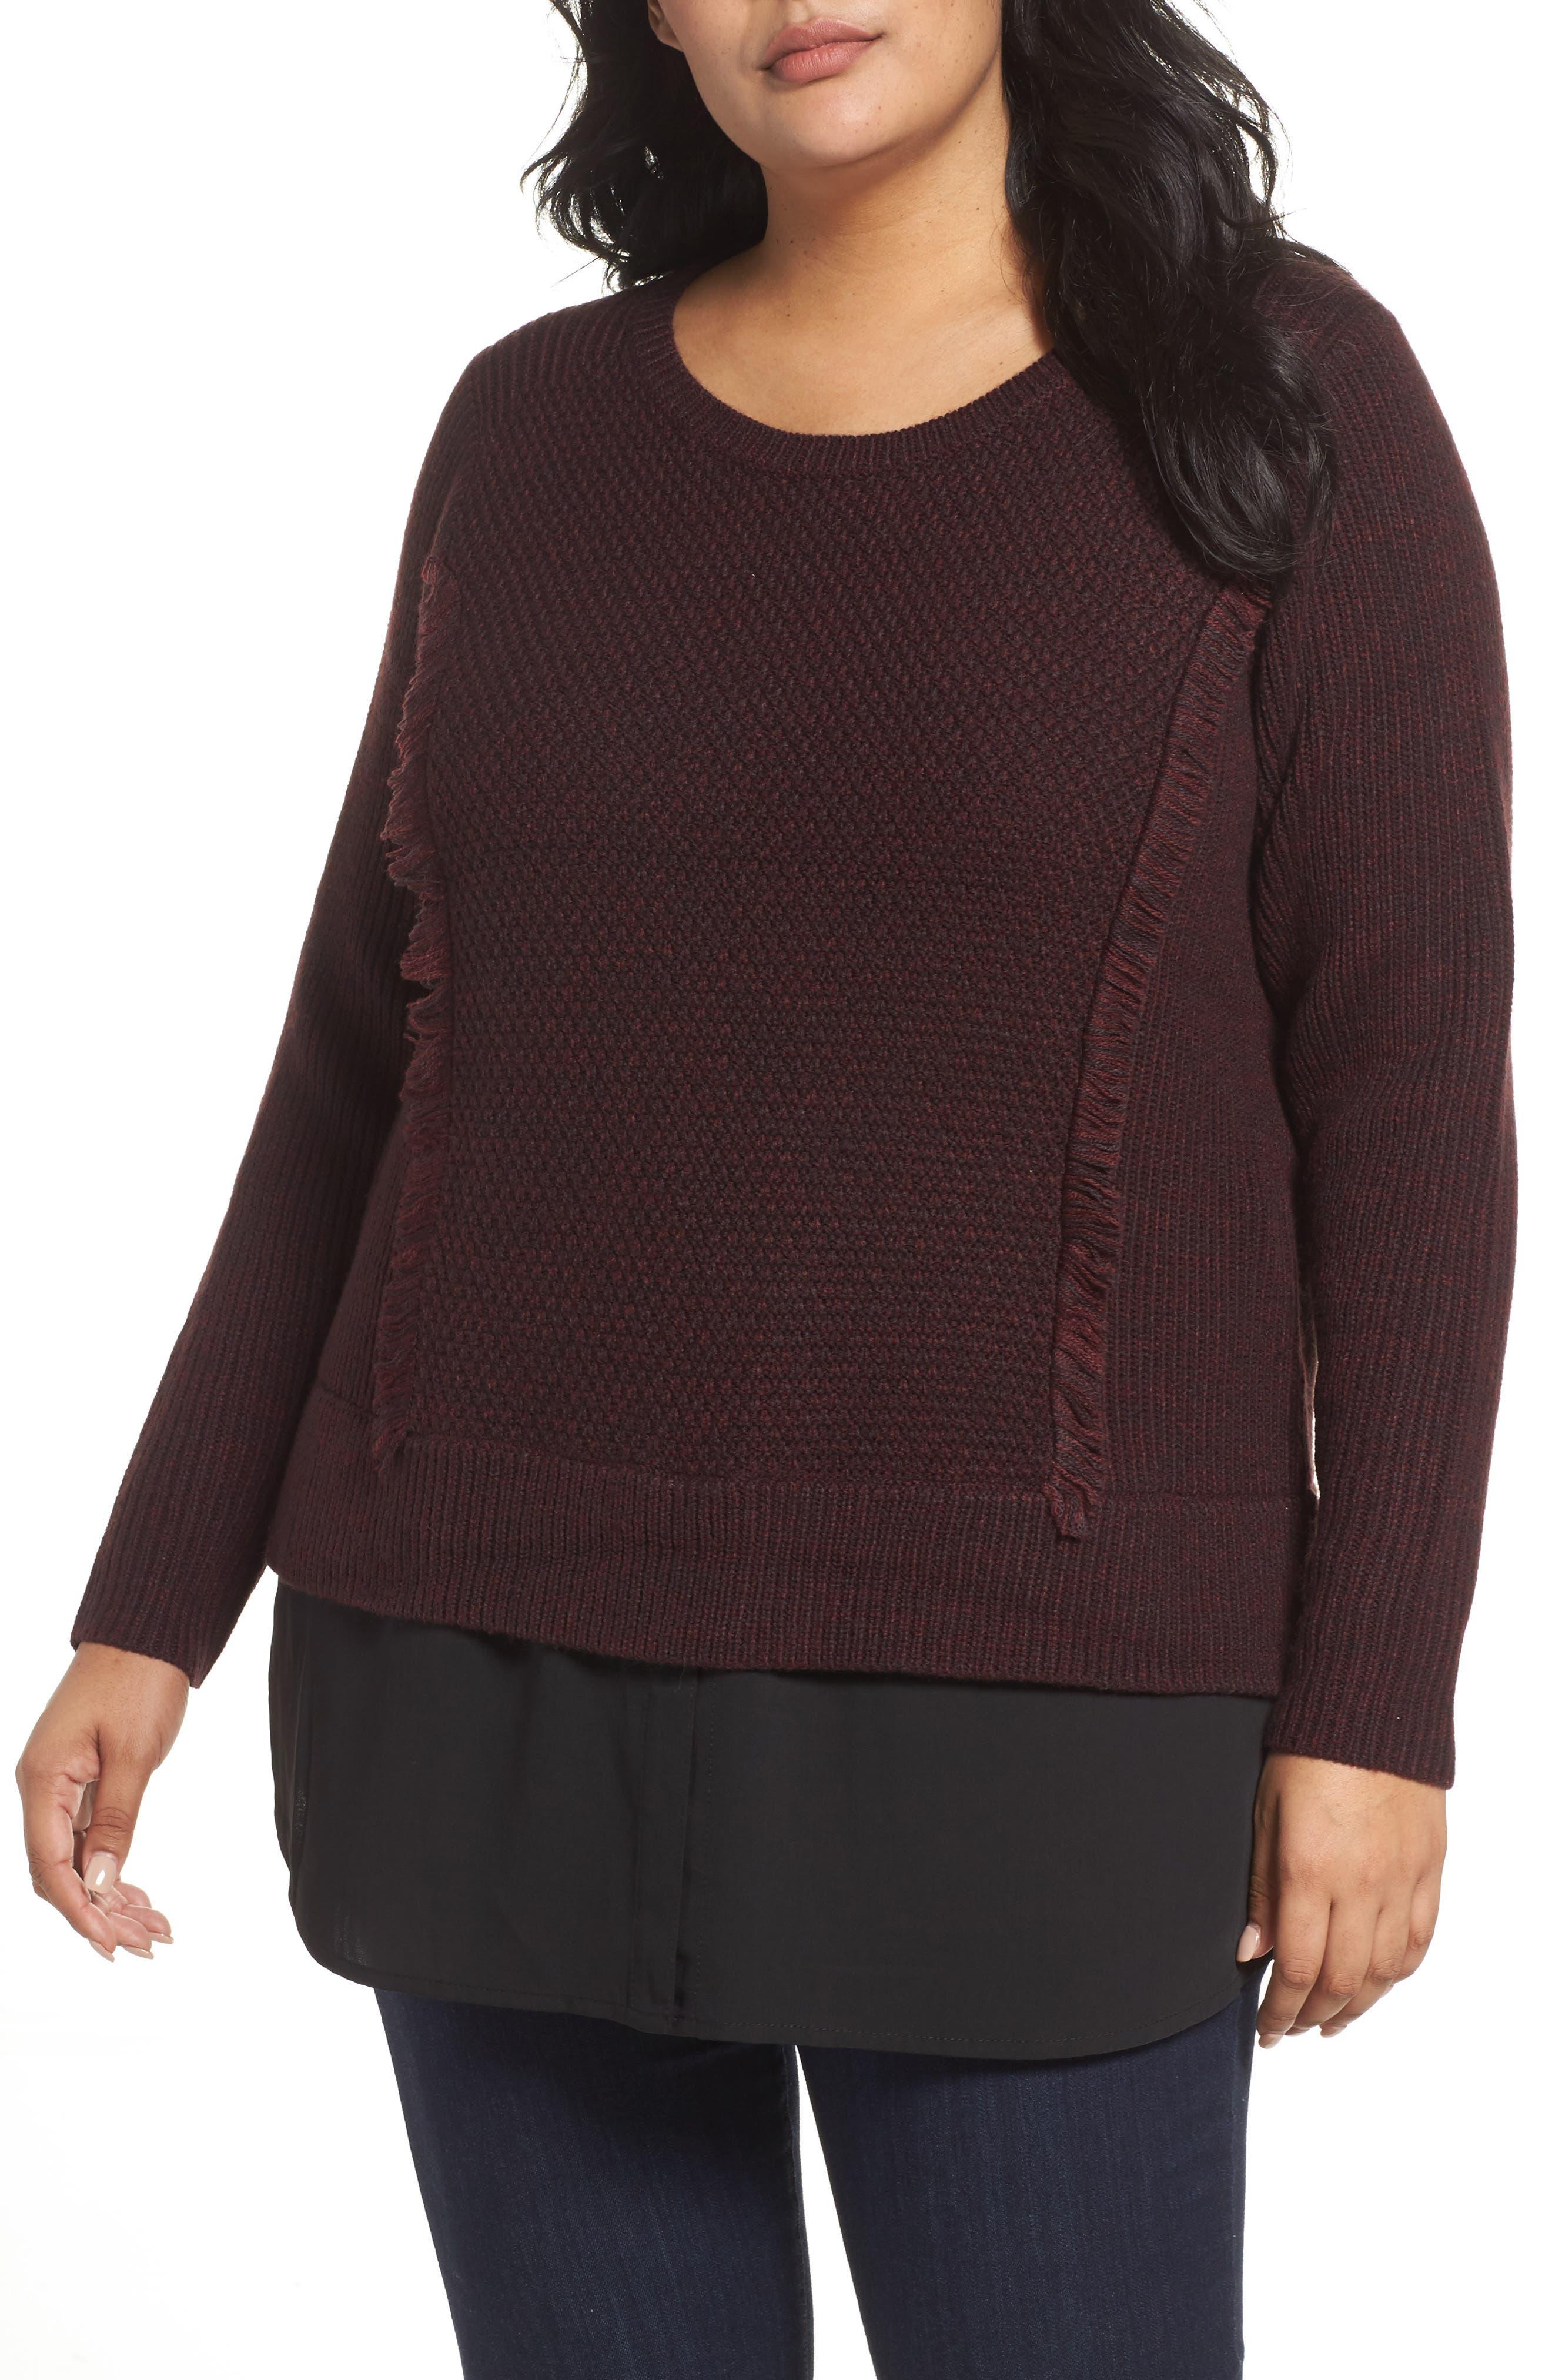 Sophia Layered Look Sweater,                             Main thumbnail 1, color,                             606